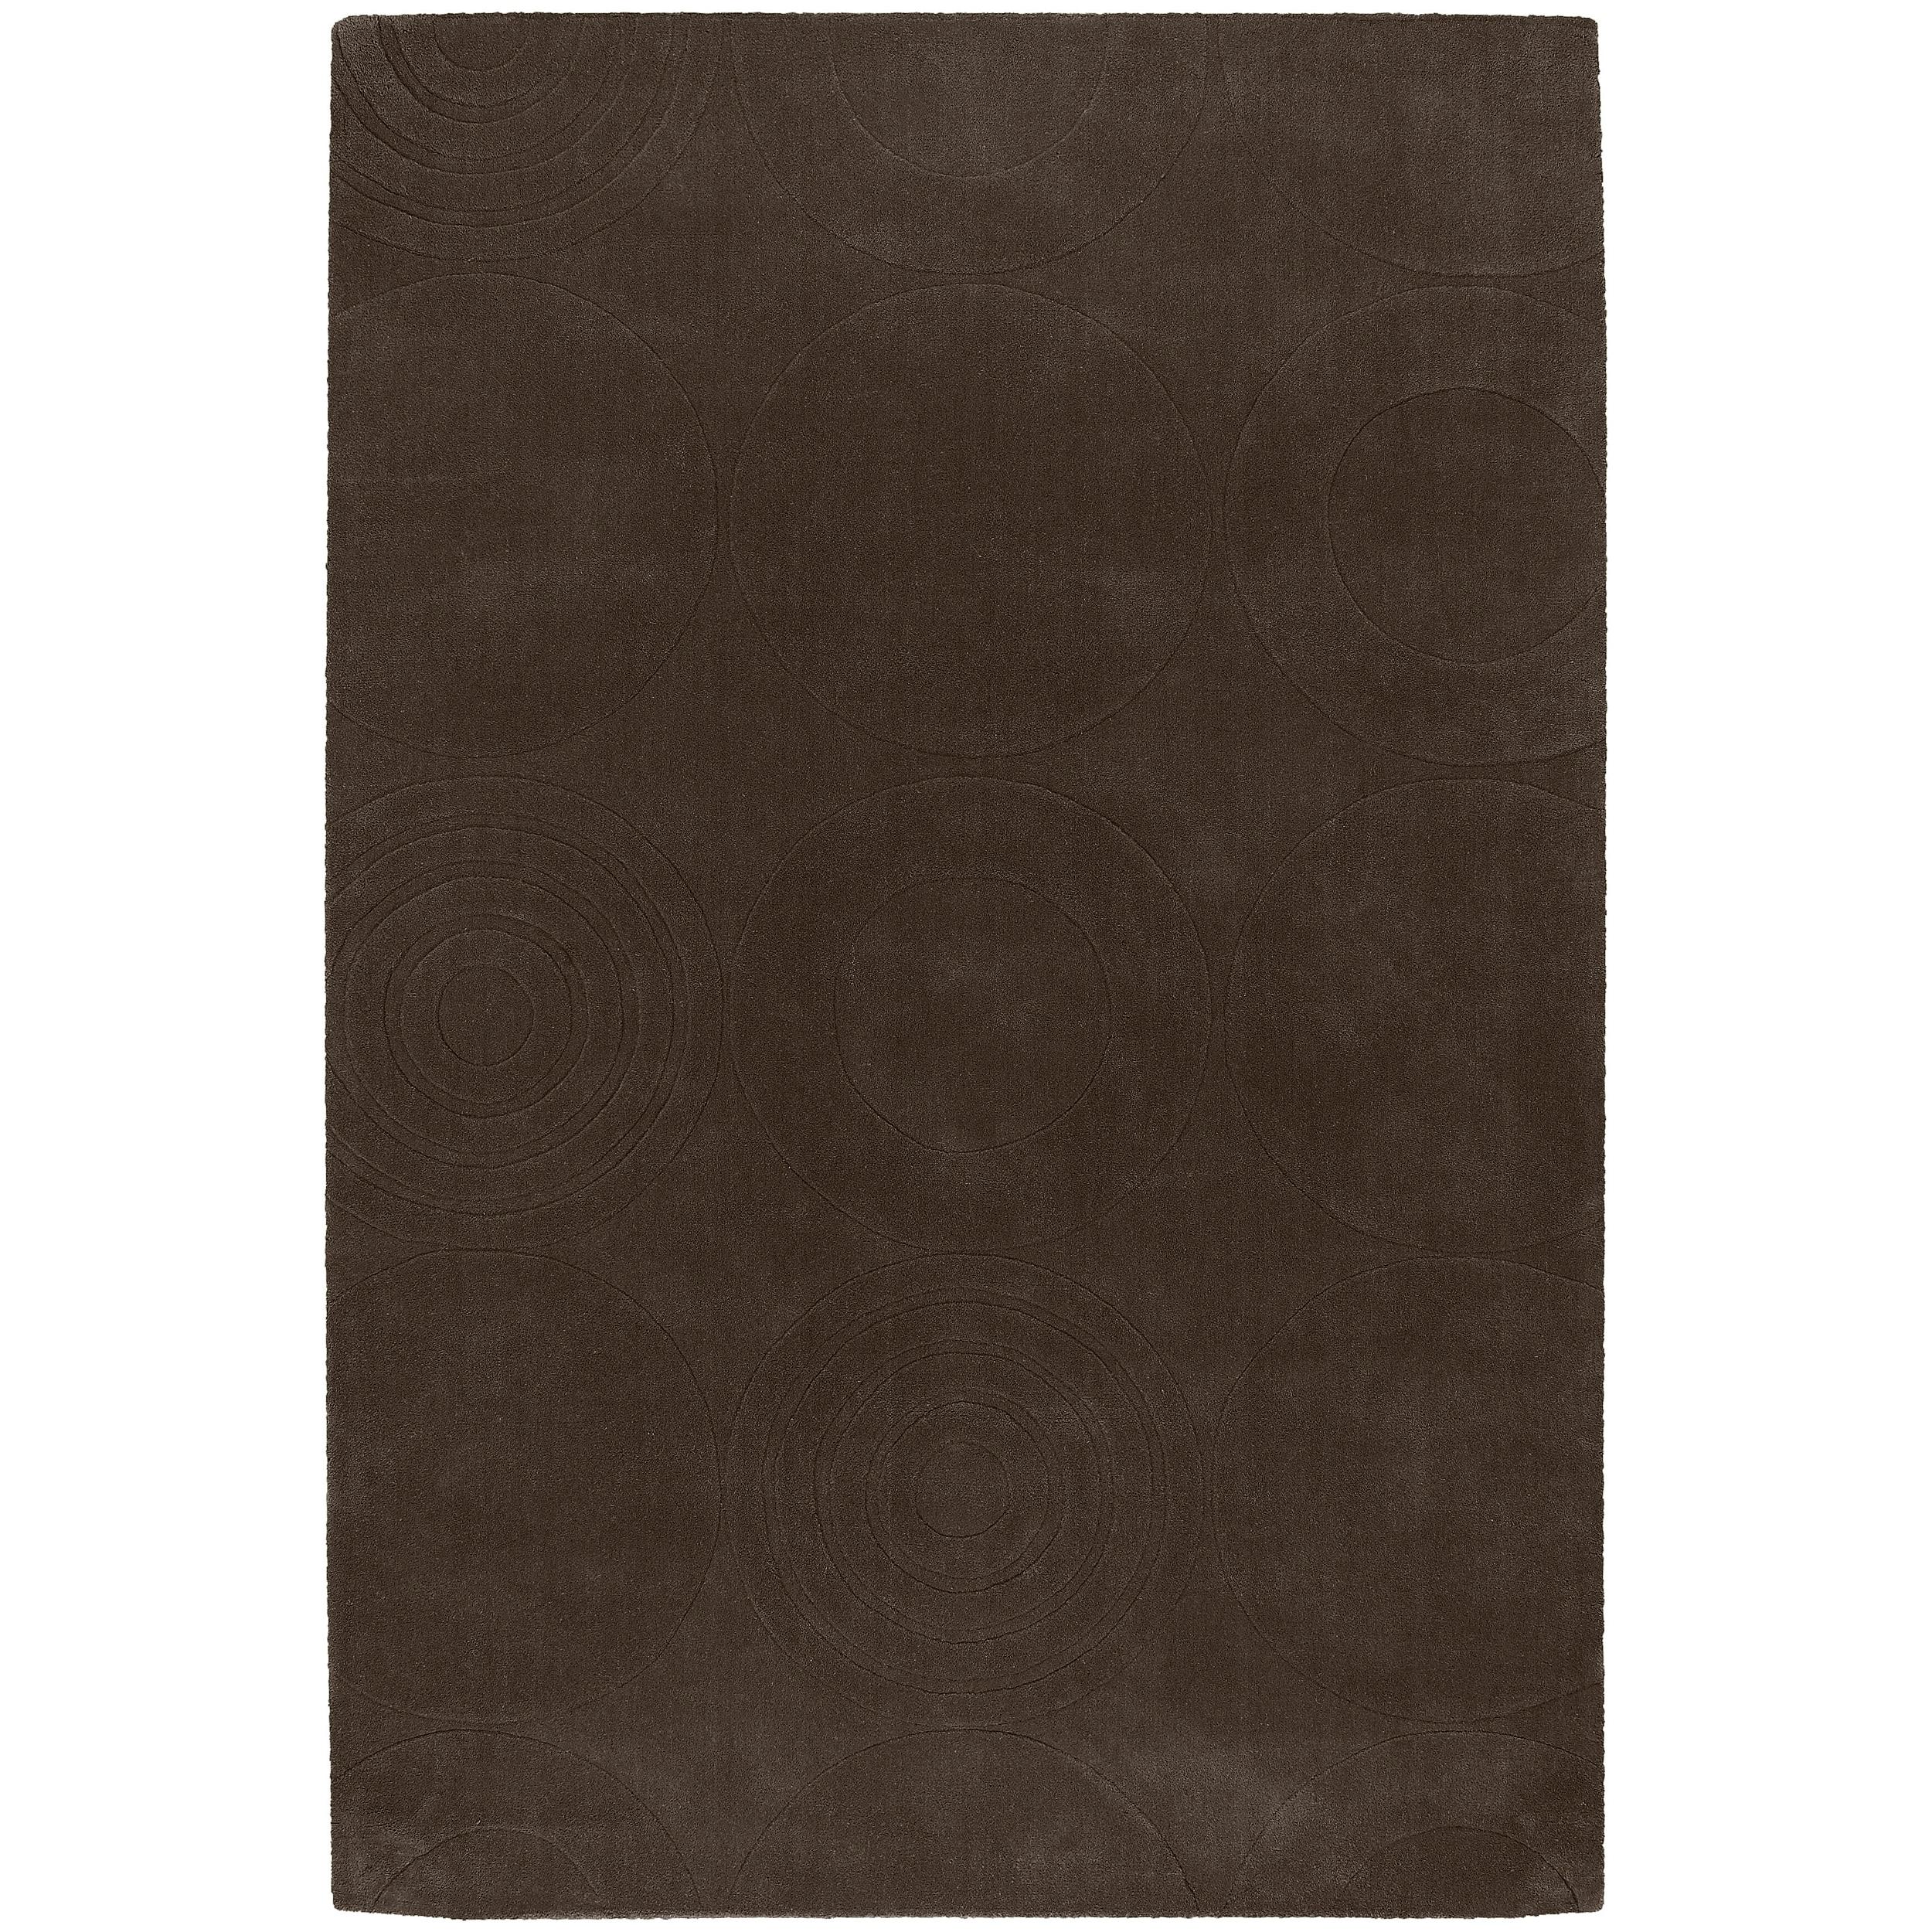 Hand-crafted Brown Geometric Clino Wool Rug (5' x 8')